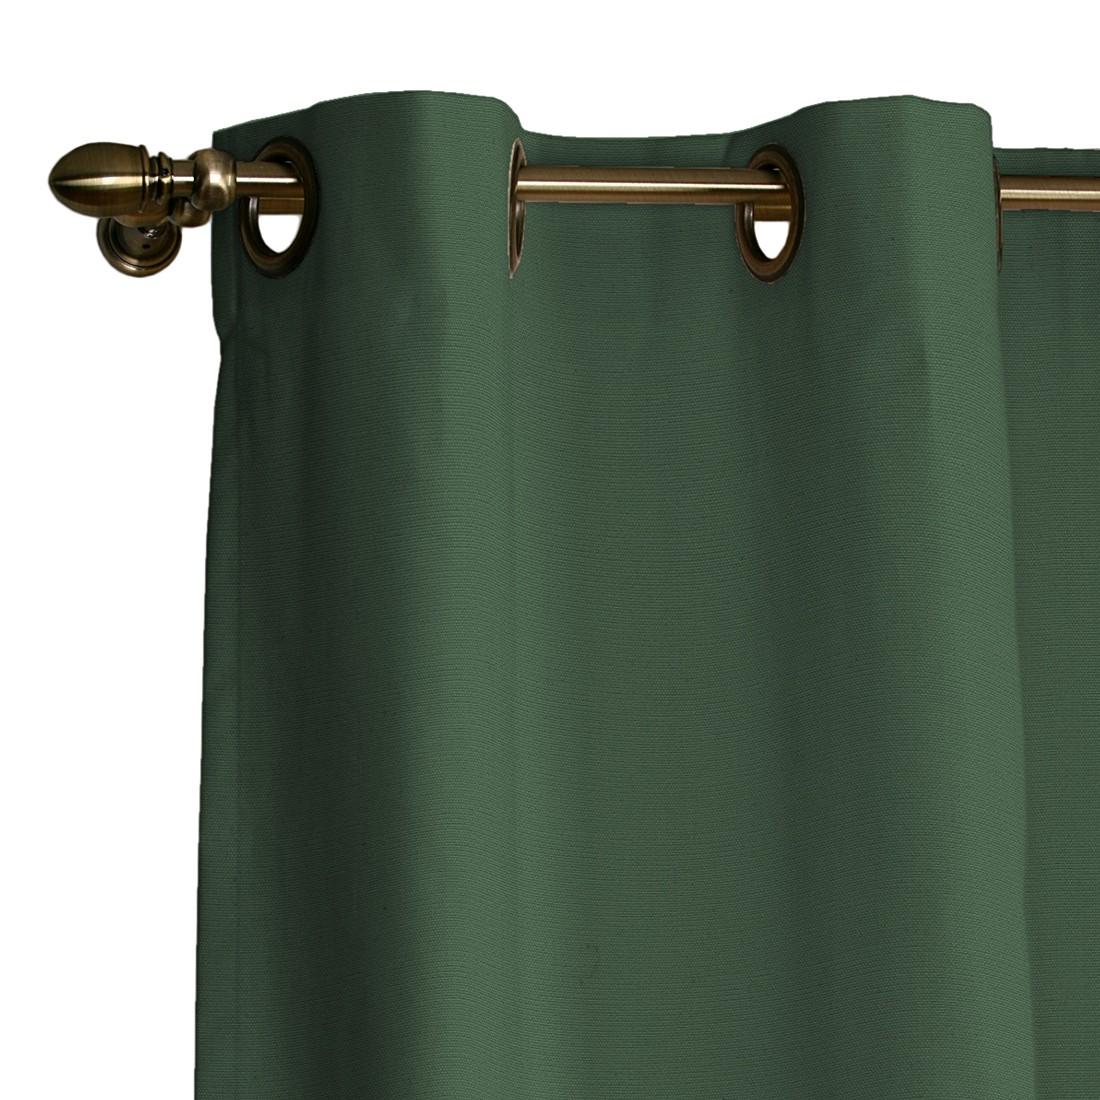 Ösenvorhang Cotton Panama – Tannengrün – 130 x 310 cm, Dekoria günstig